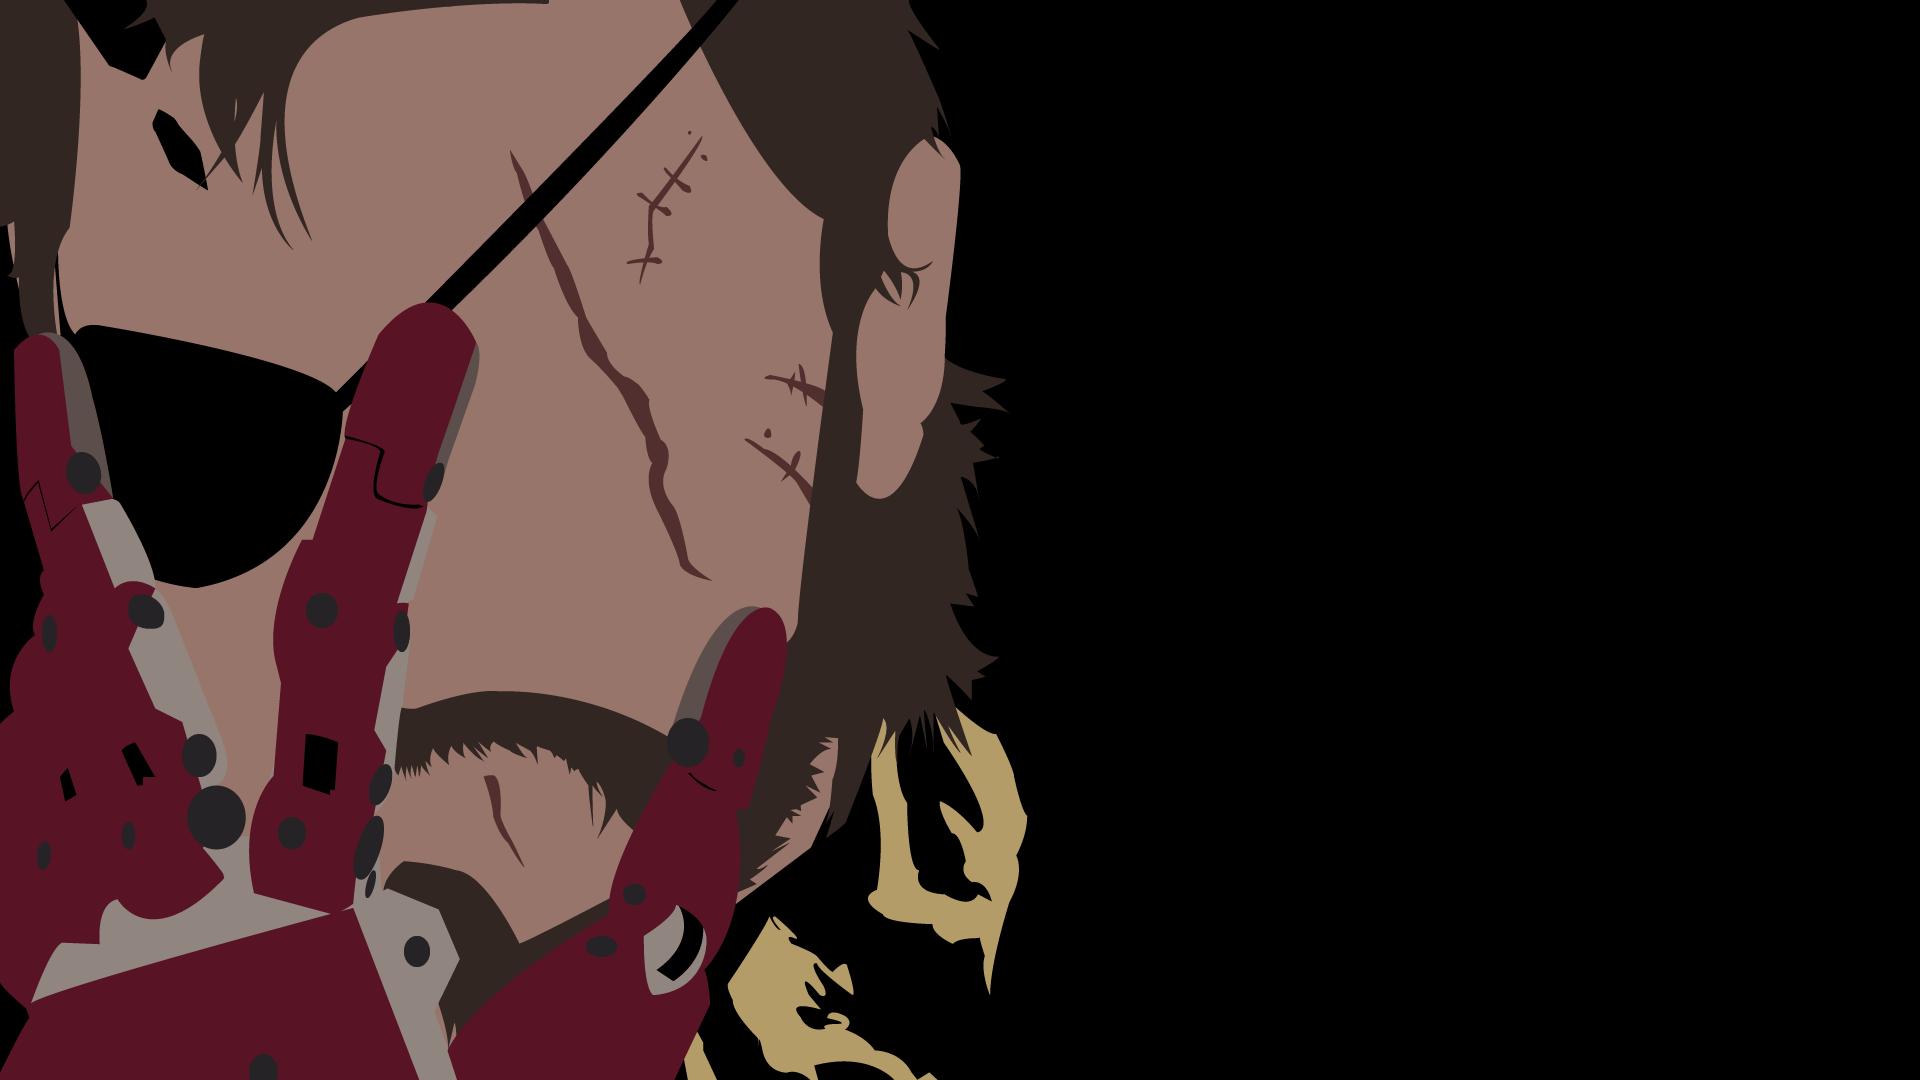 Venom Snake Metal Gear Solid V The Phantom Pain By